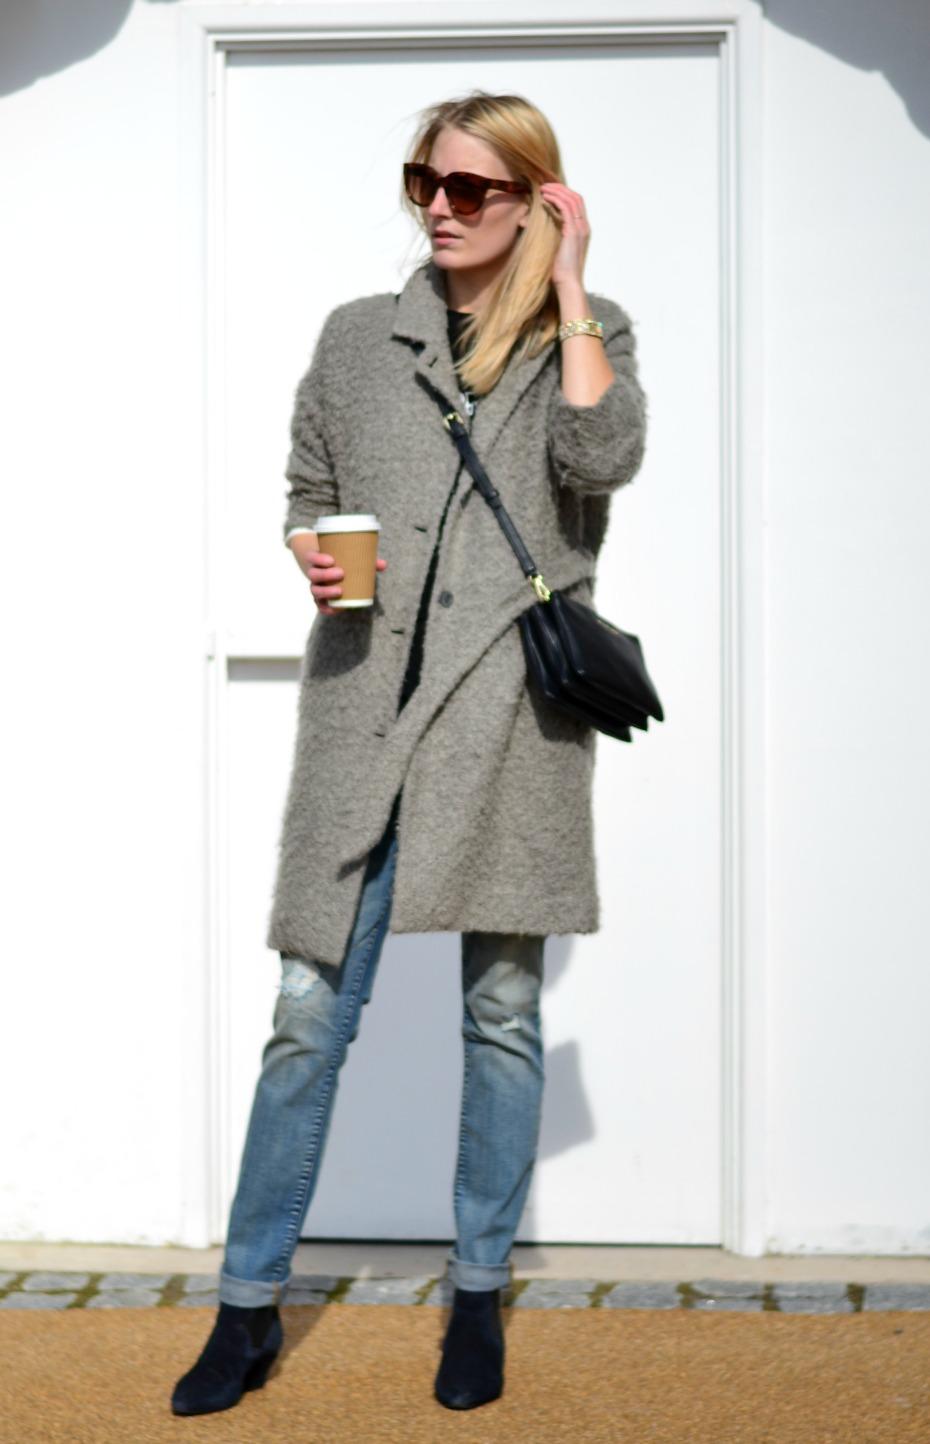 gap boyfriend jeans_céline sunglasses_acne alma_michael kors trio1